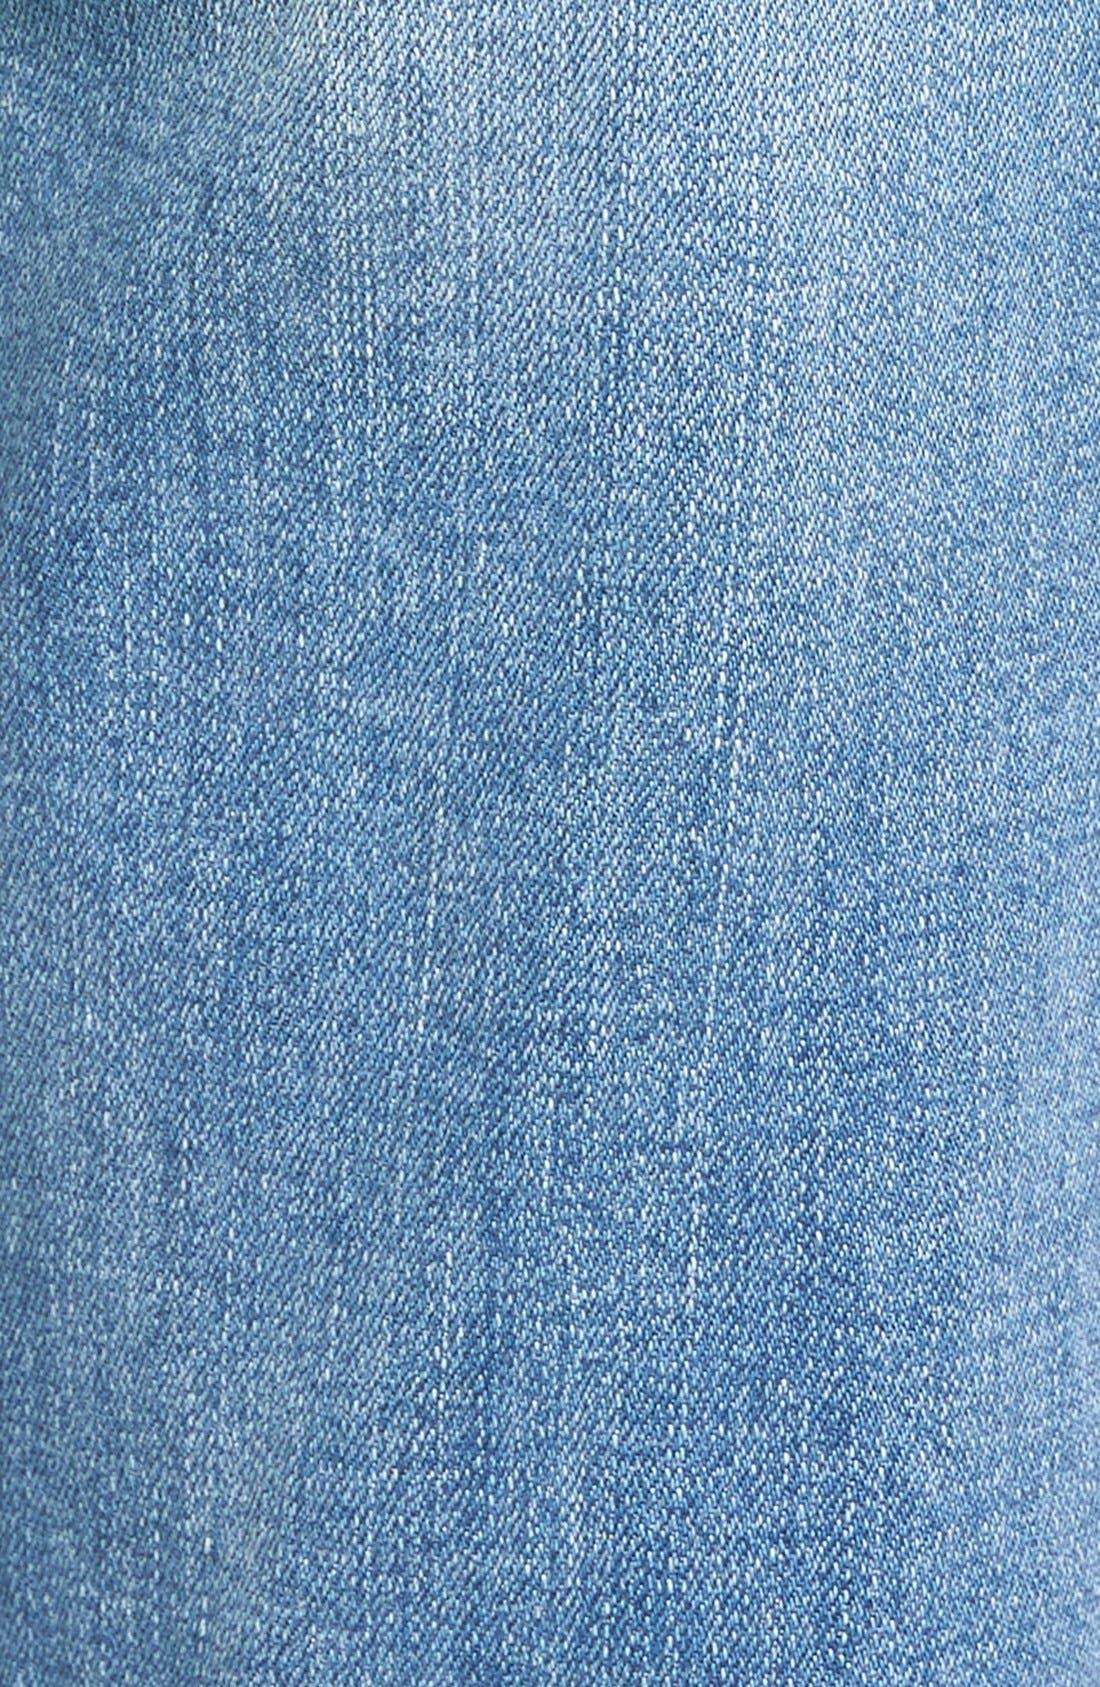 Alternate Image 6  - 7 For All Mankind® Josefina Embroidered Boyfriend Jeans (Denim Embroidery Botanical)